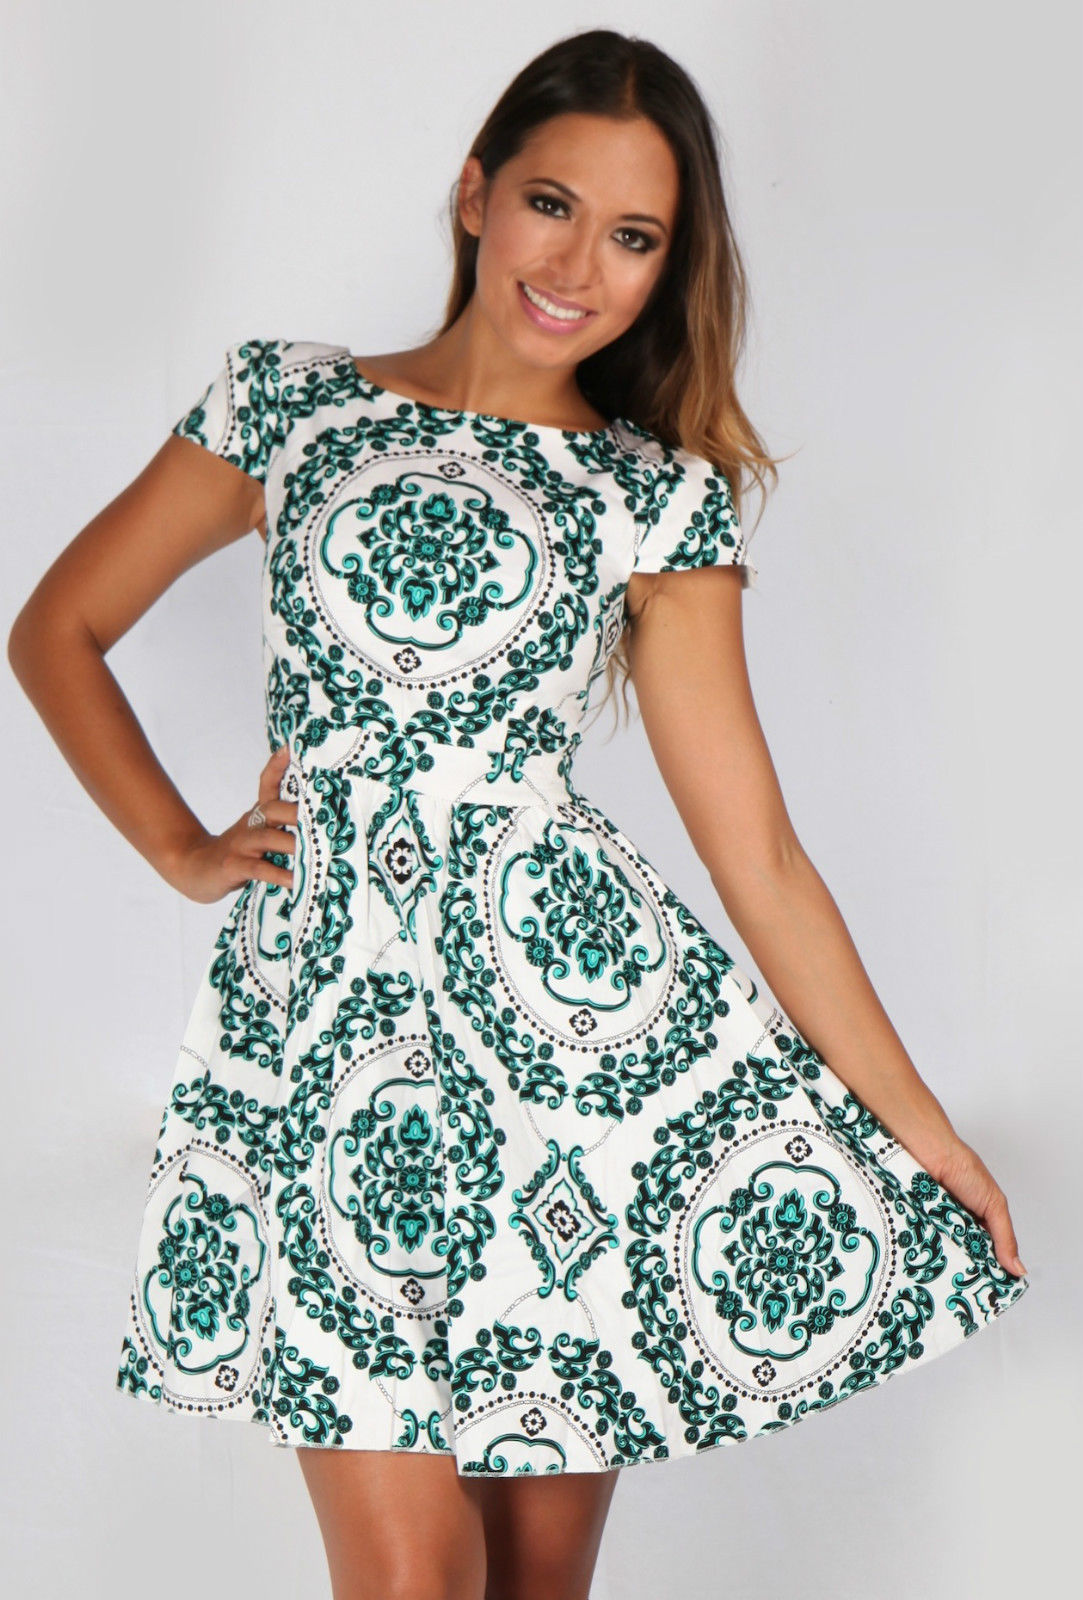 Green Floral Dress - Green Black u0026 White Skater   UsTrendy